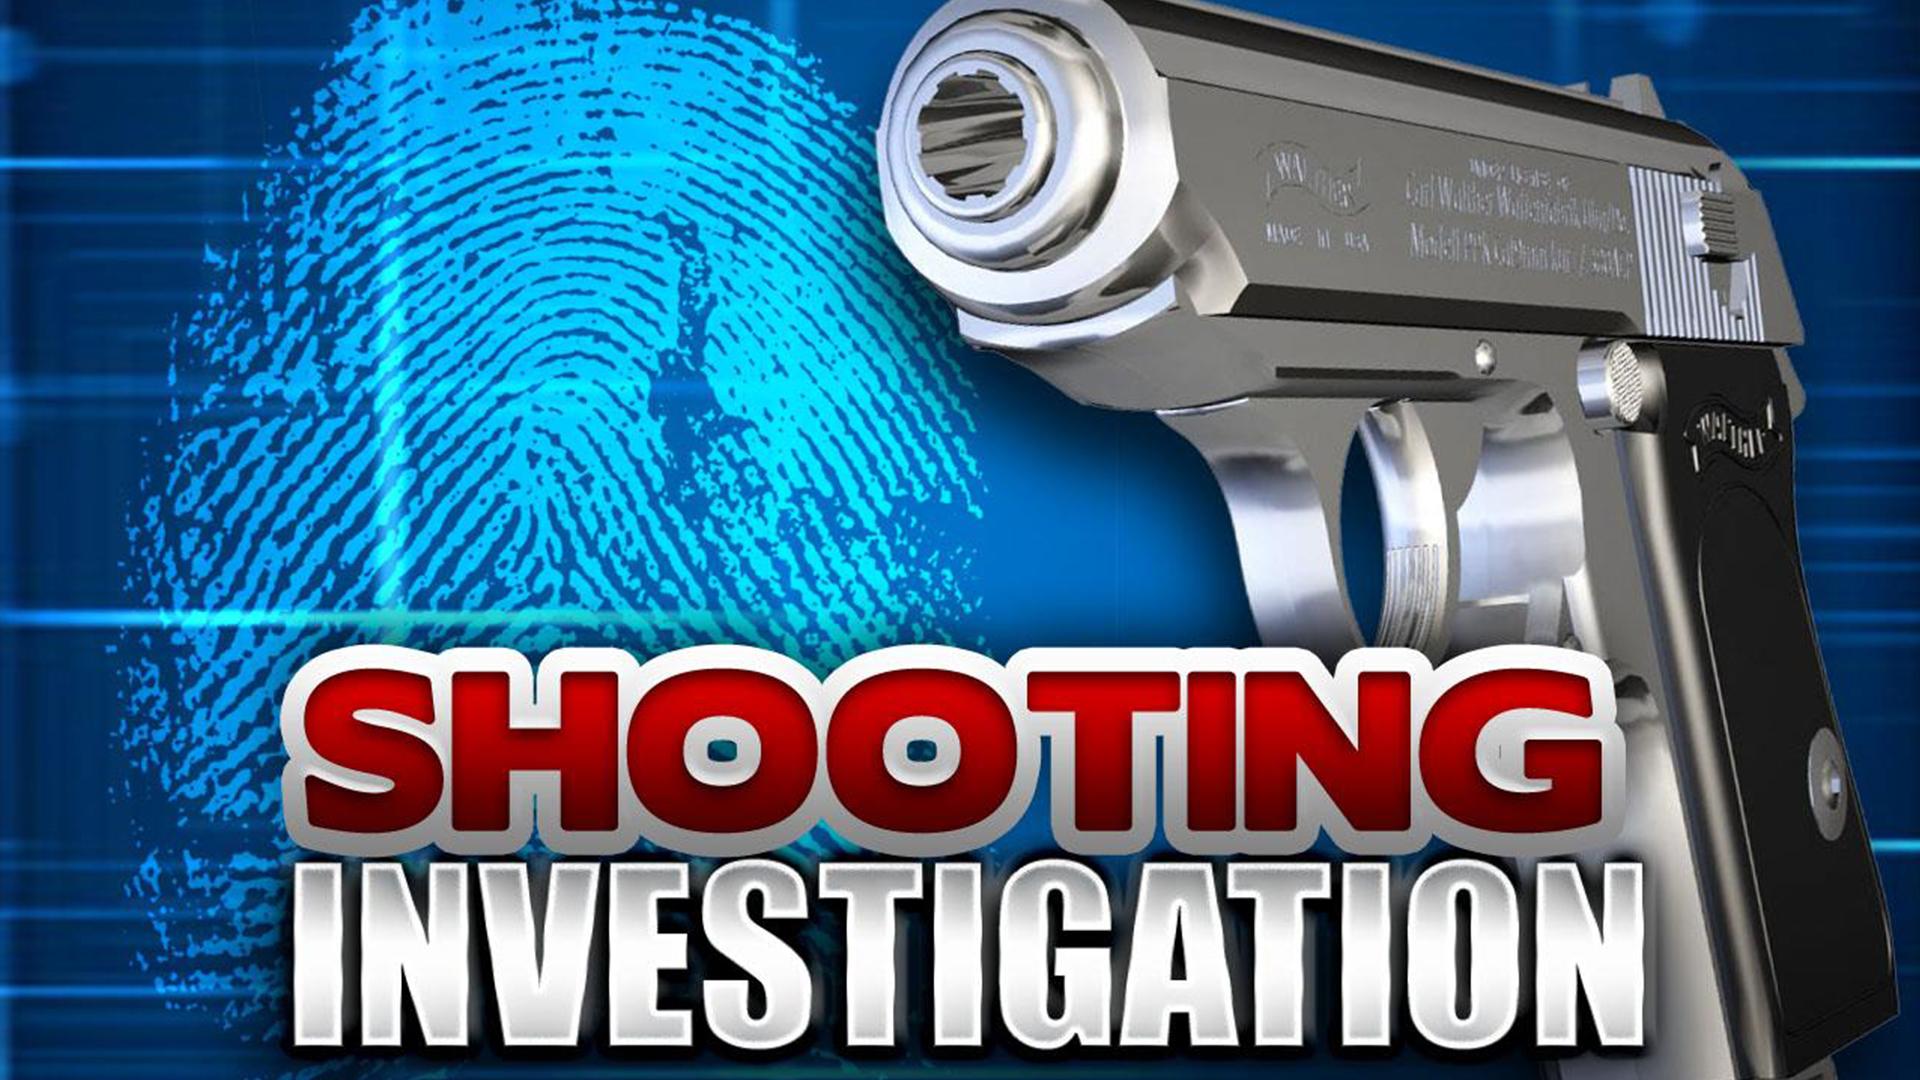 shooting investigation_1456634423130.jpg